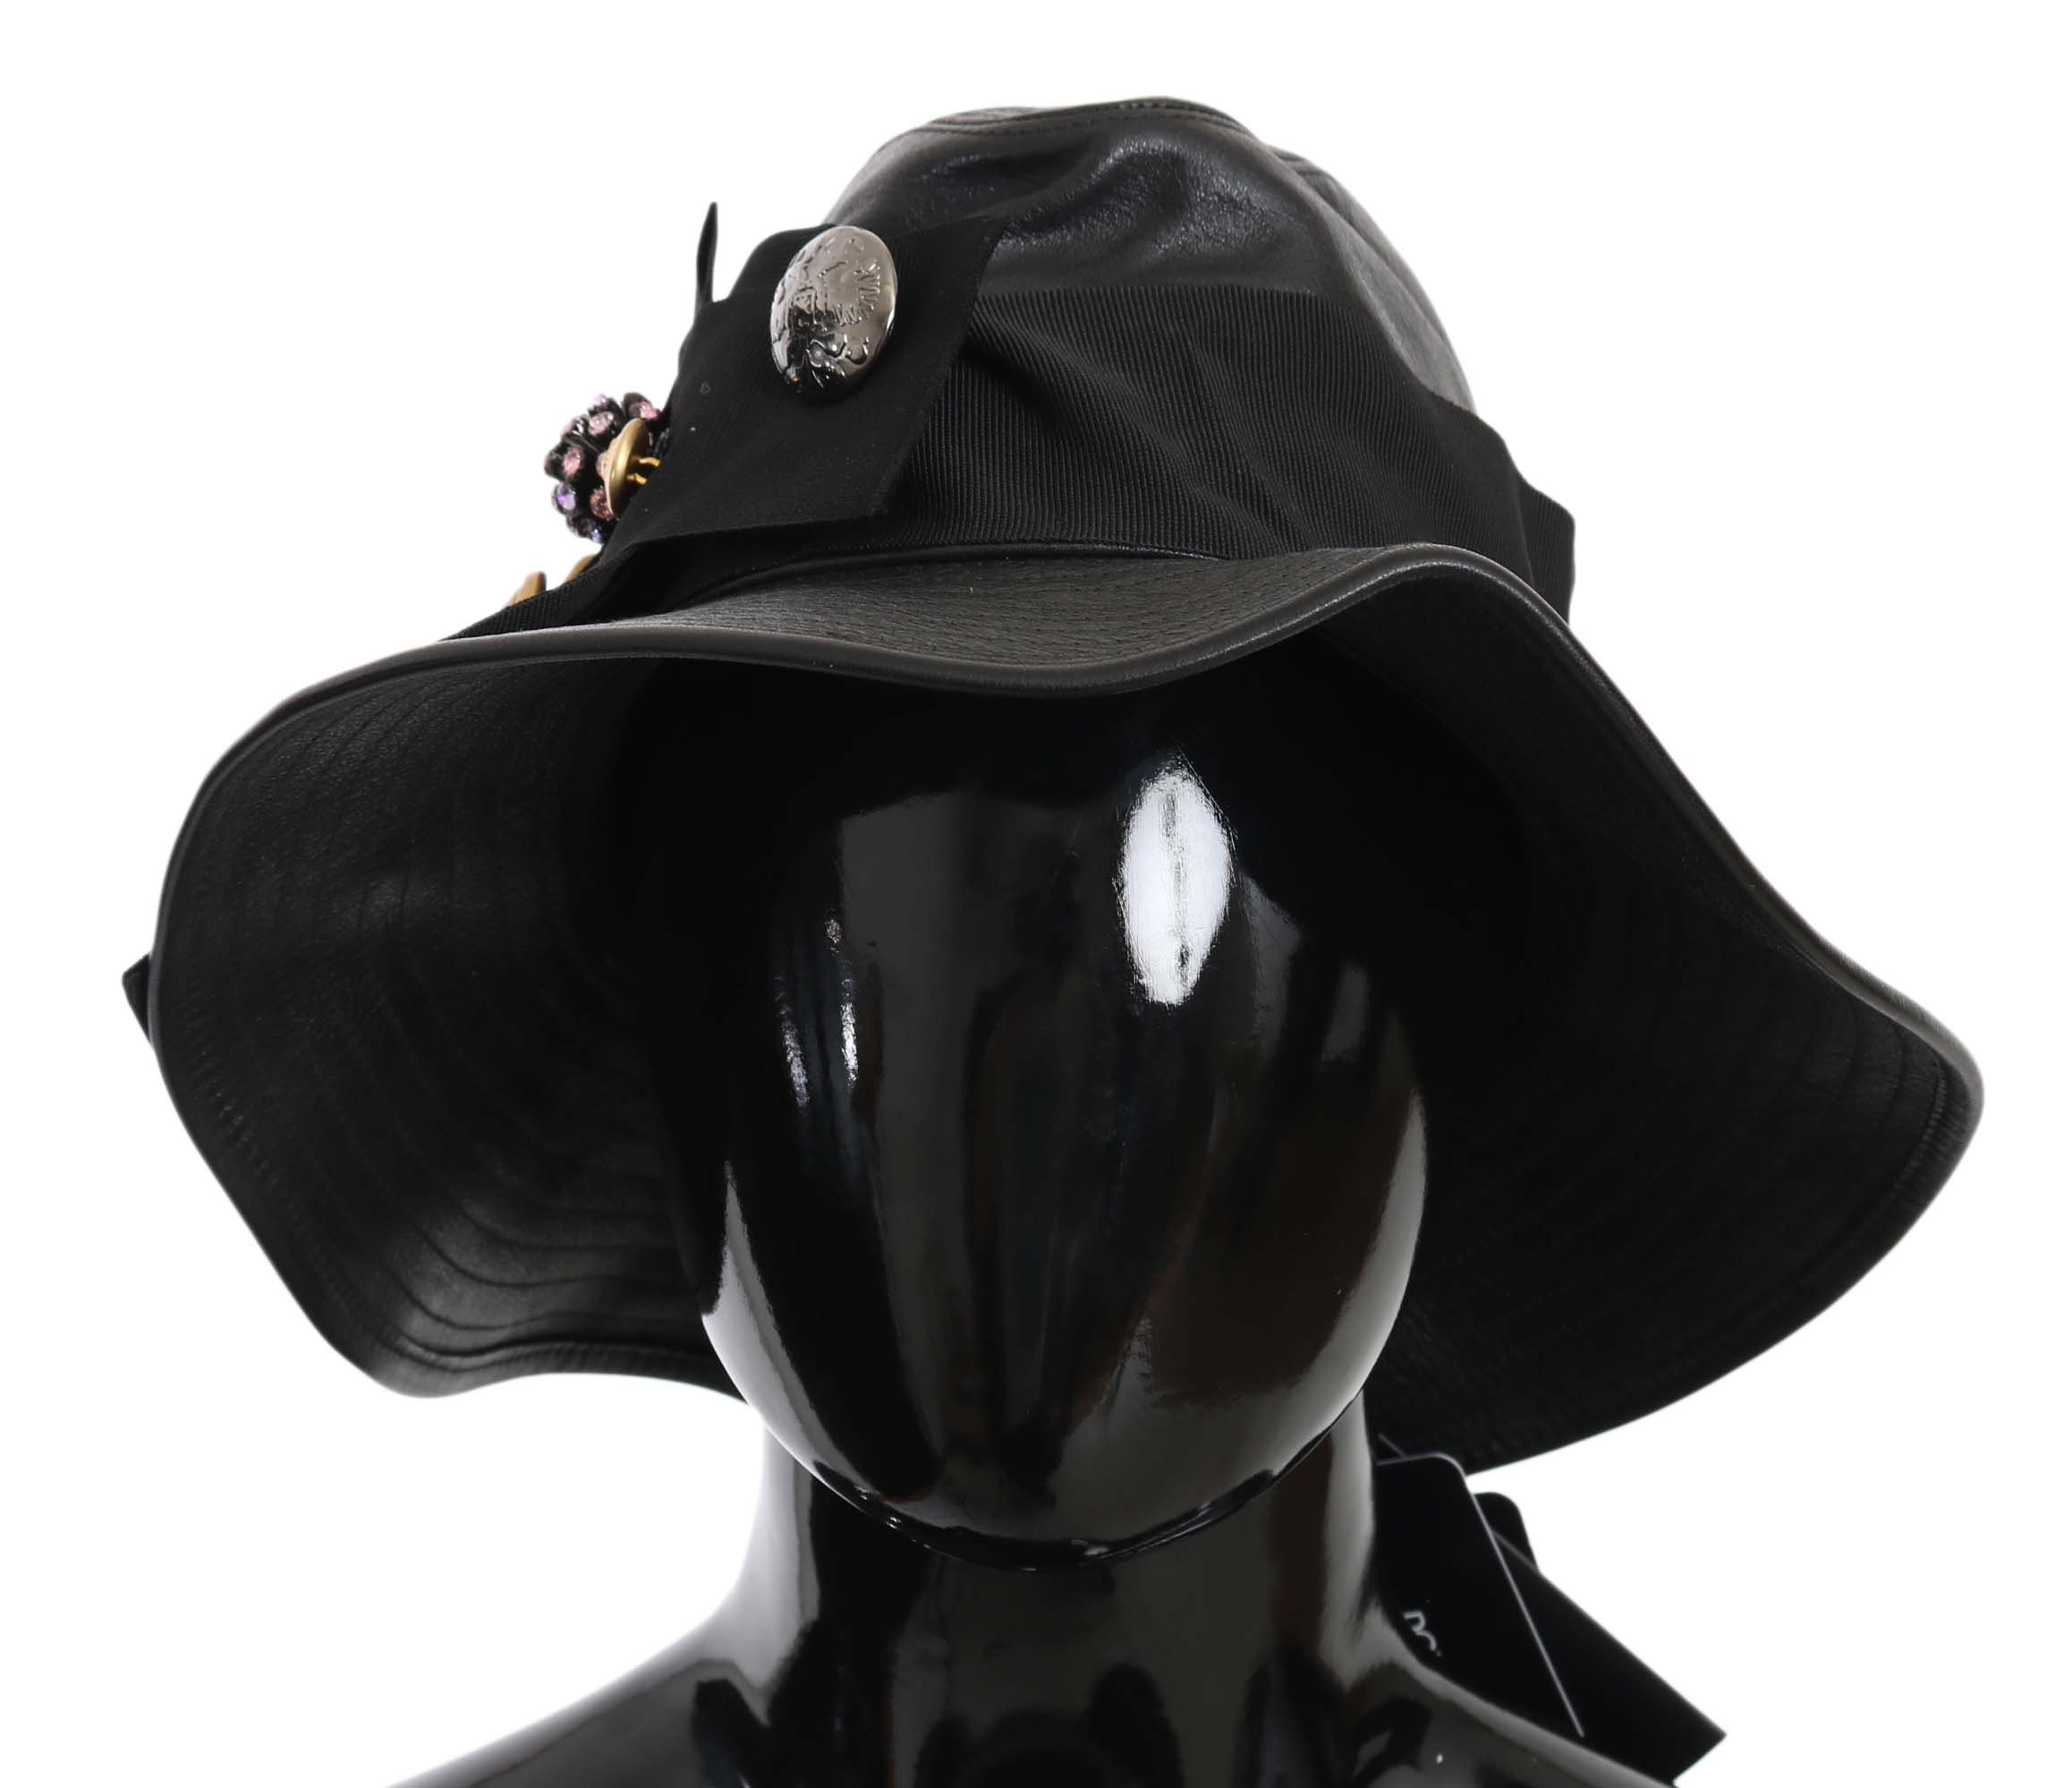 Dolce & Gabbana Women's Hat Black HAT70222 - 58 cm M